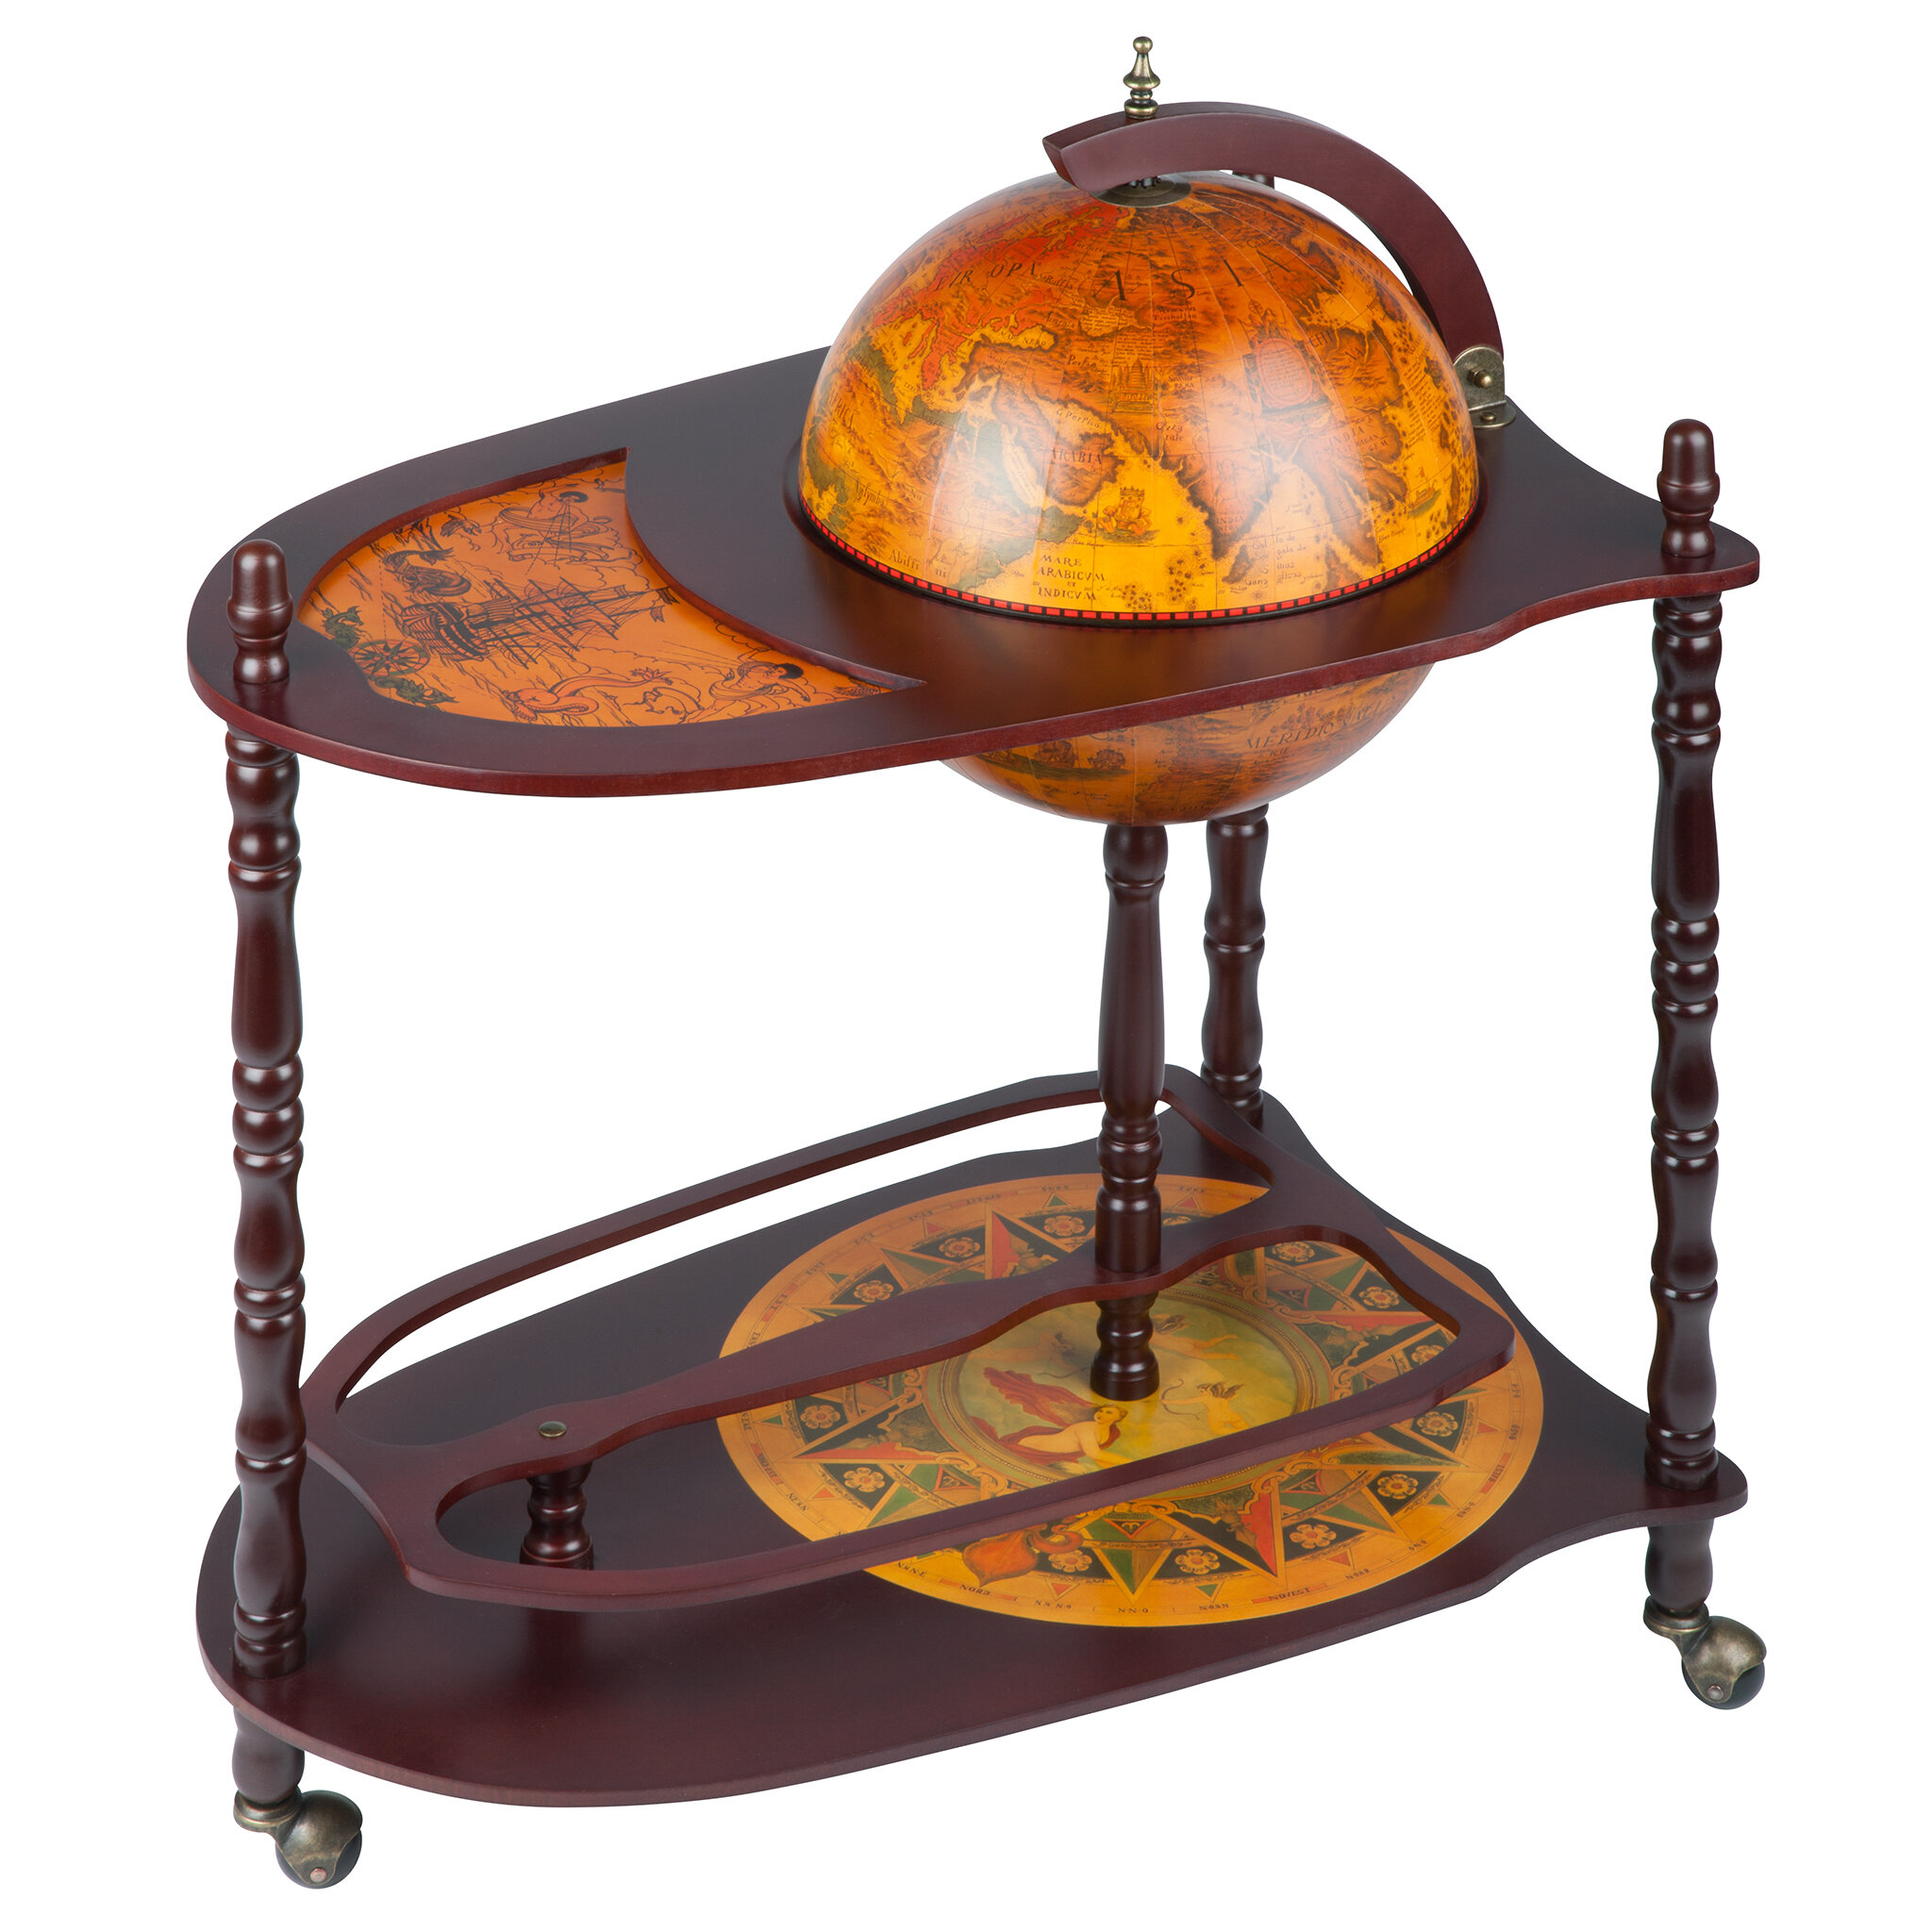 Design Toscano Old World Extended Shelf Italian Replica Globe Bar Cart Reviews Wayfair